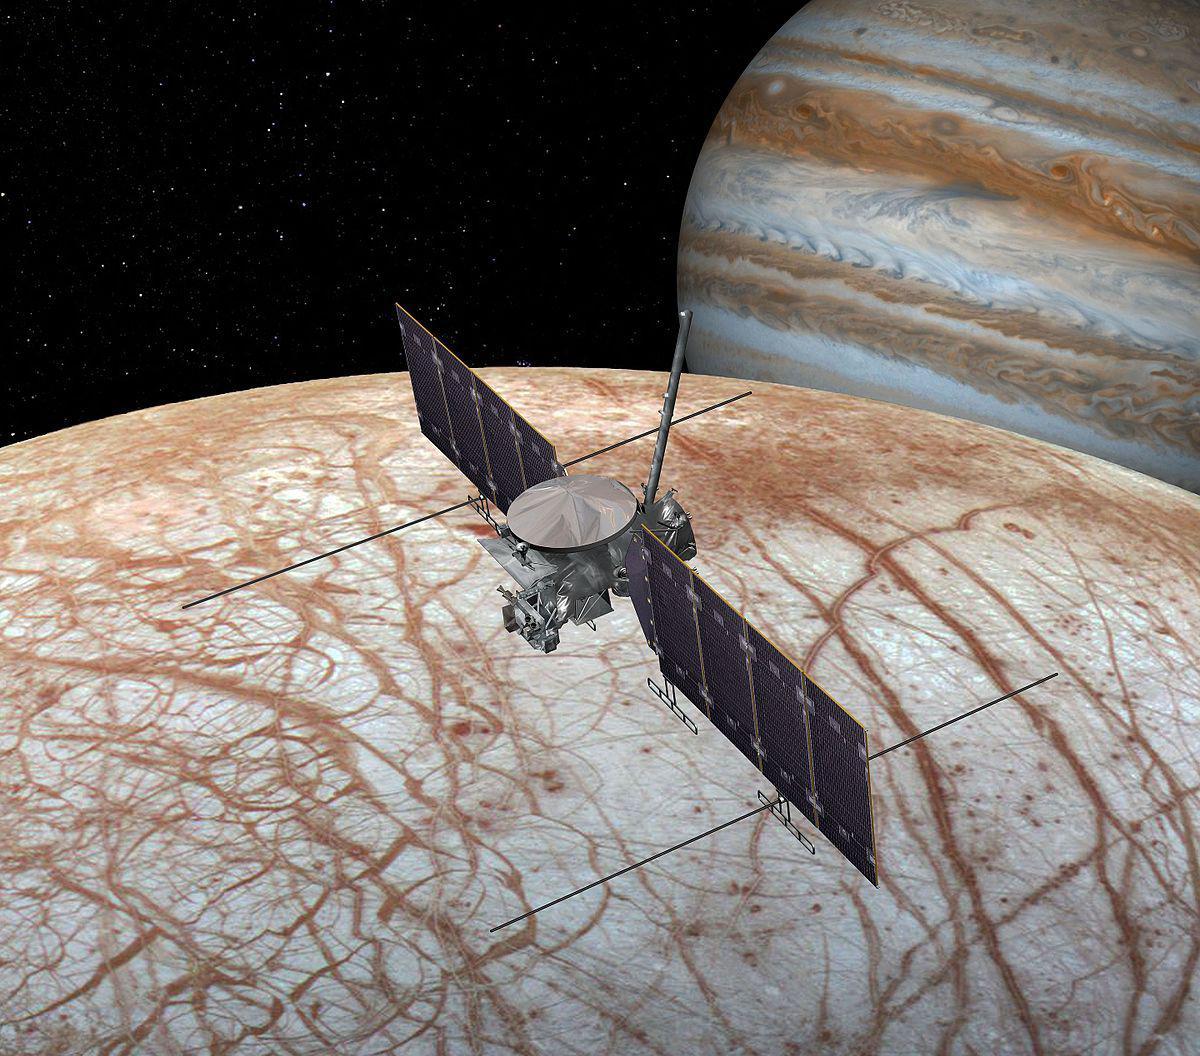 https://universemagazine.com/wp-content/uploads/2019/03/Europa_Mission_Spacecraft_-_Artists_Rendering.jpg